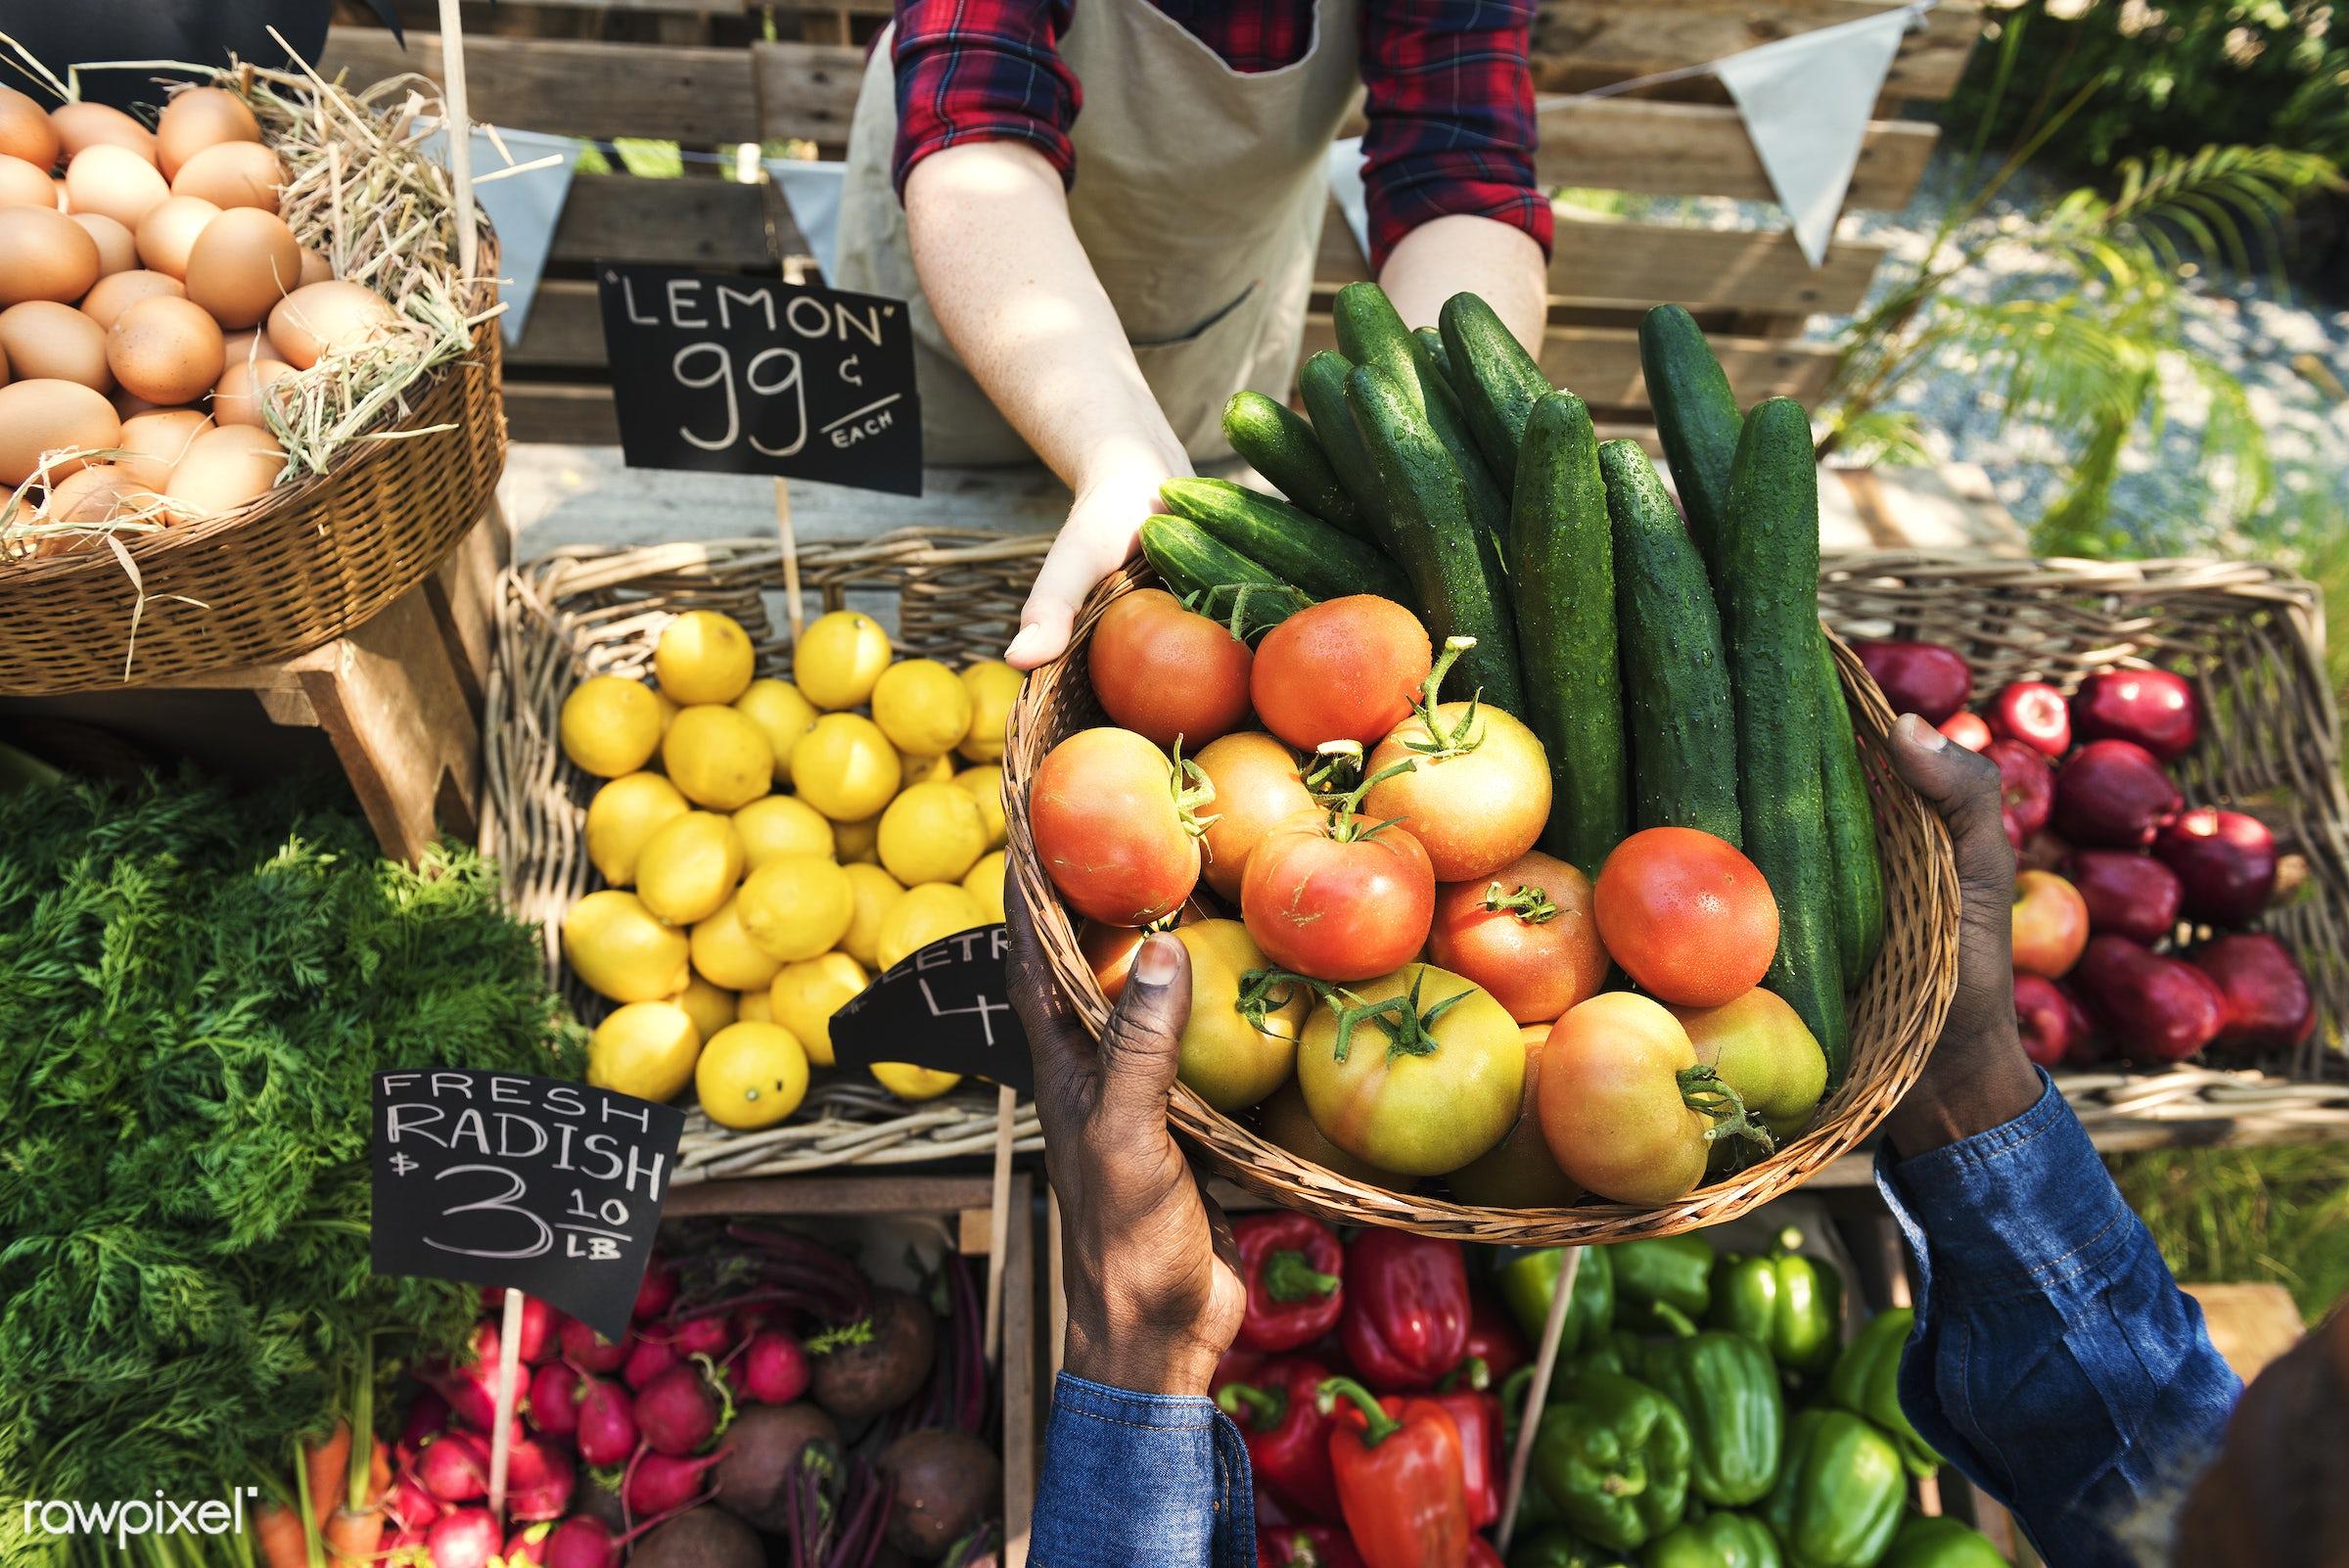 shop, person, stall, buy, people, farmer, woman, choosing, choose, consumers, display, nutrition, market, eggs, price, food...